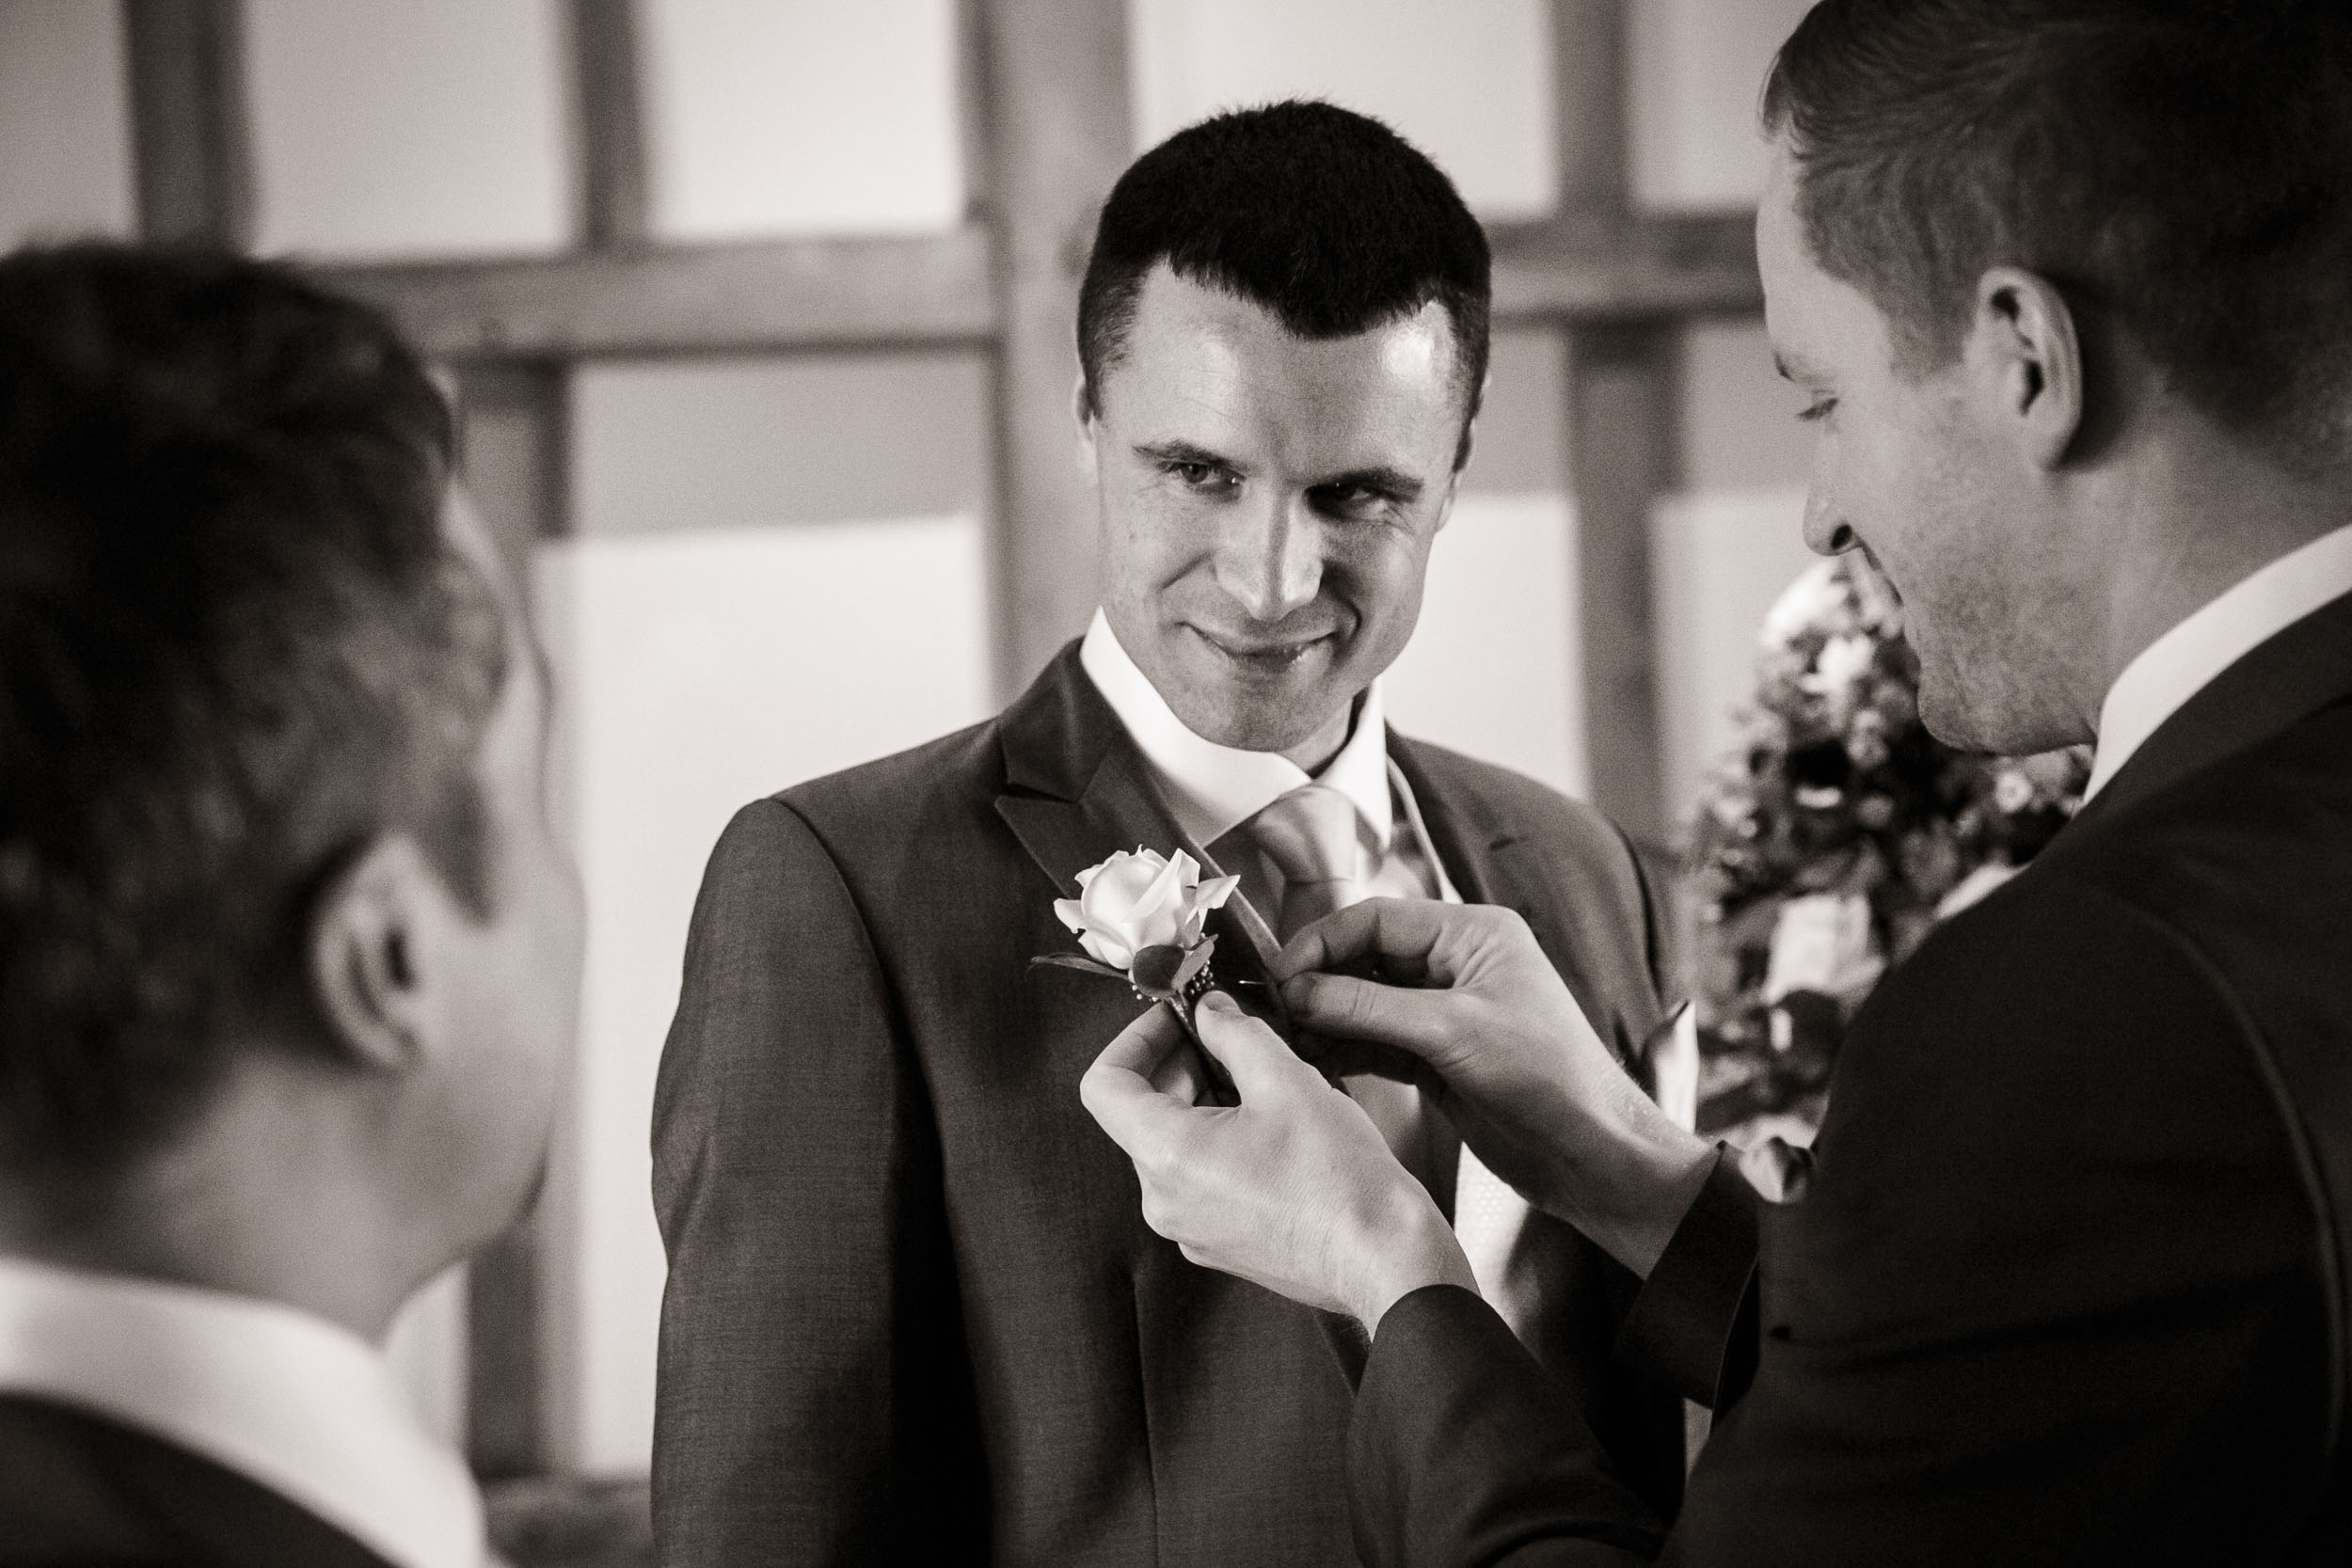 micklefield-hall-wedding-photographer 016.jpg